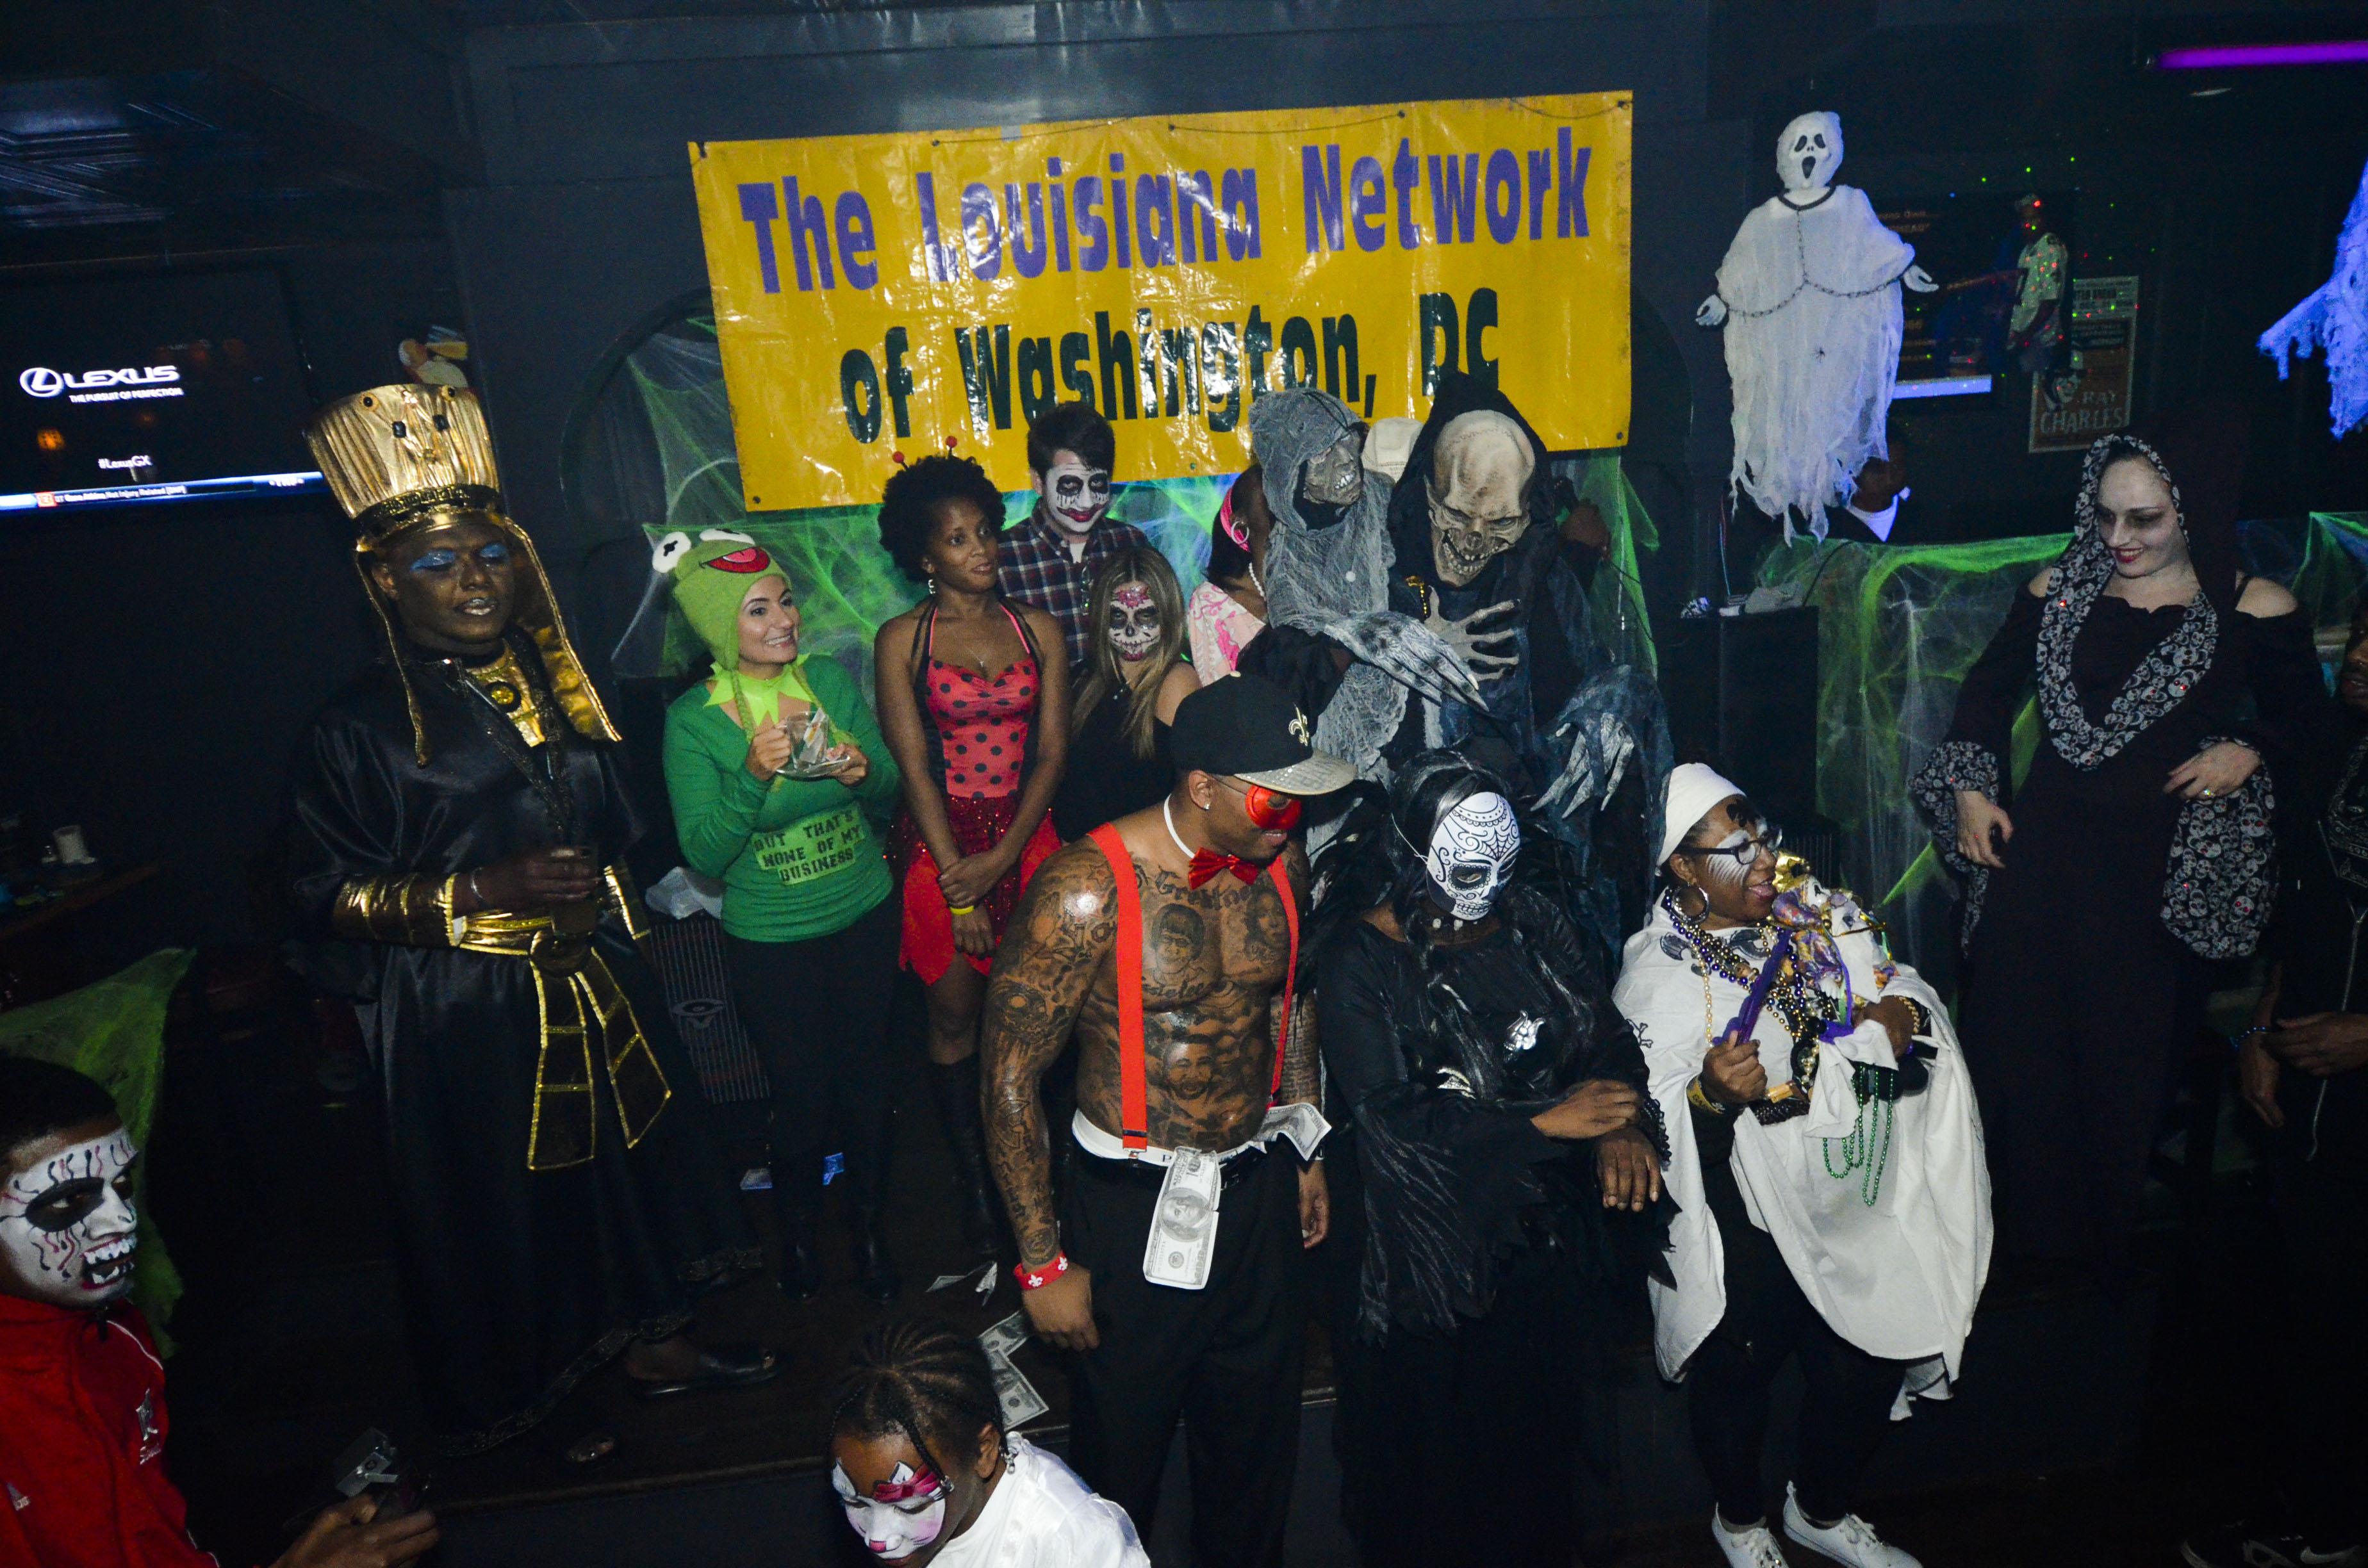 Saints Halloween Costume @Uptown Tap House